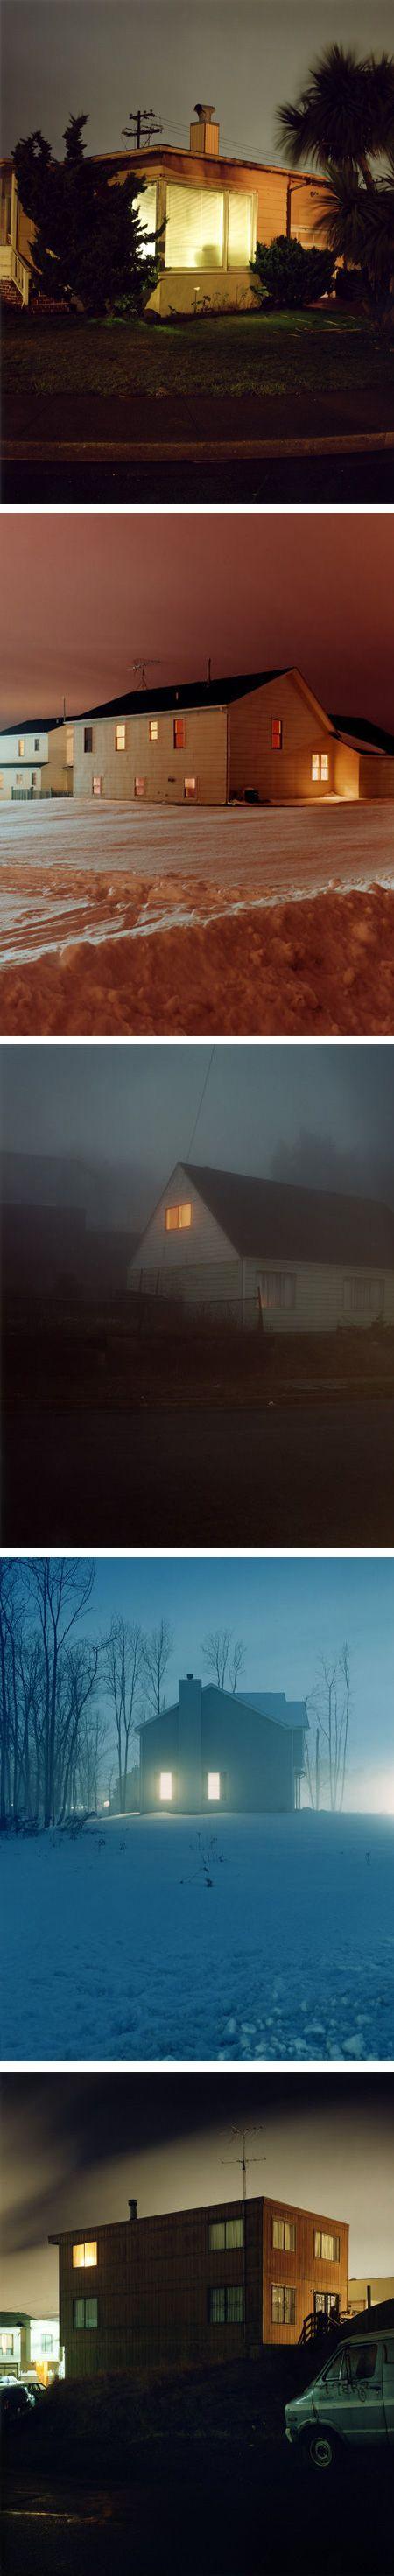 homes at night - todd hido [link to todd hido's website]